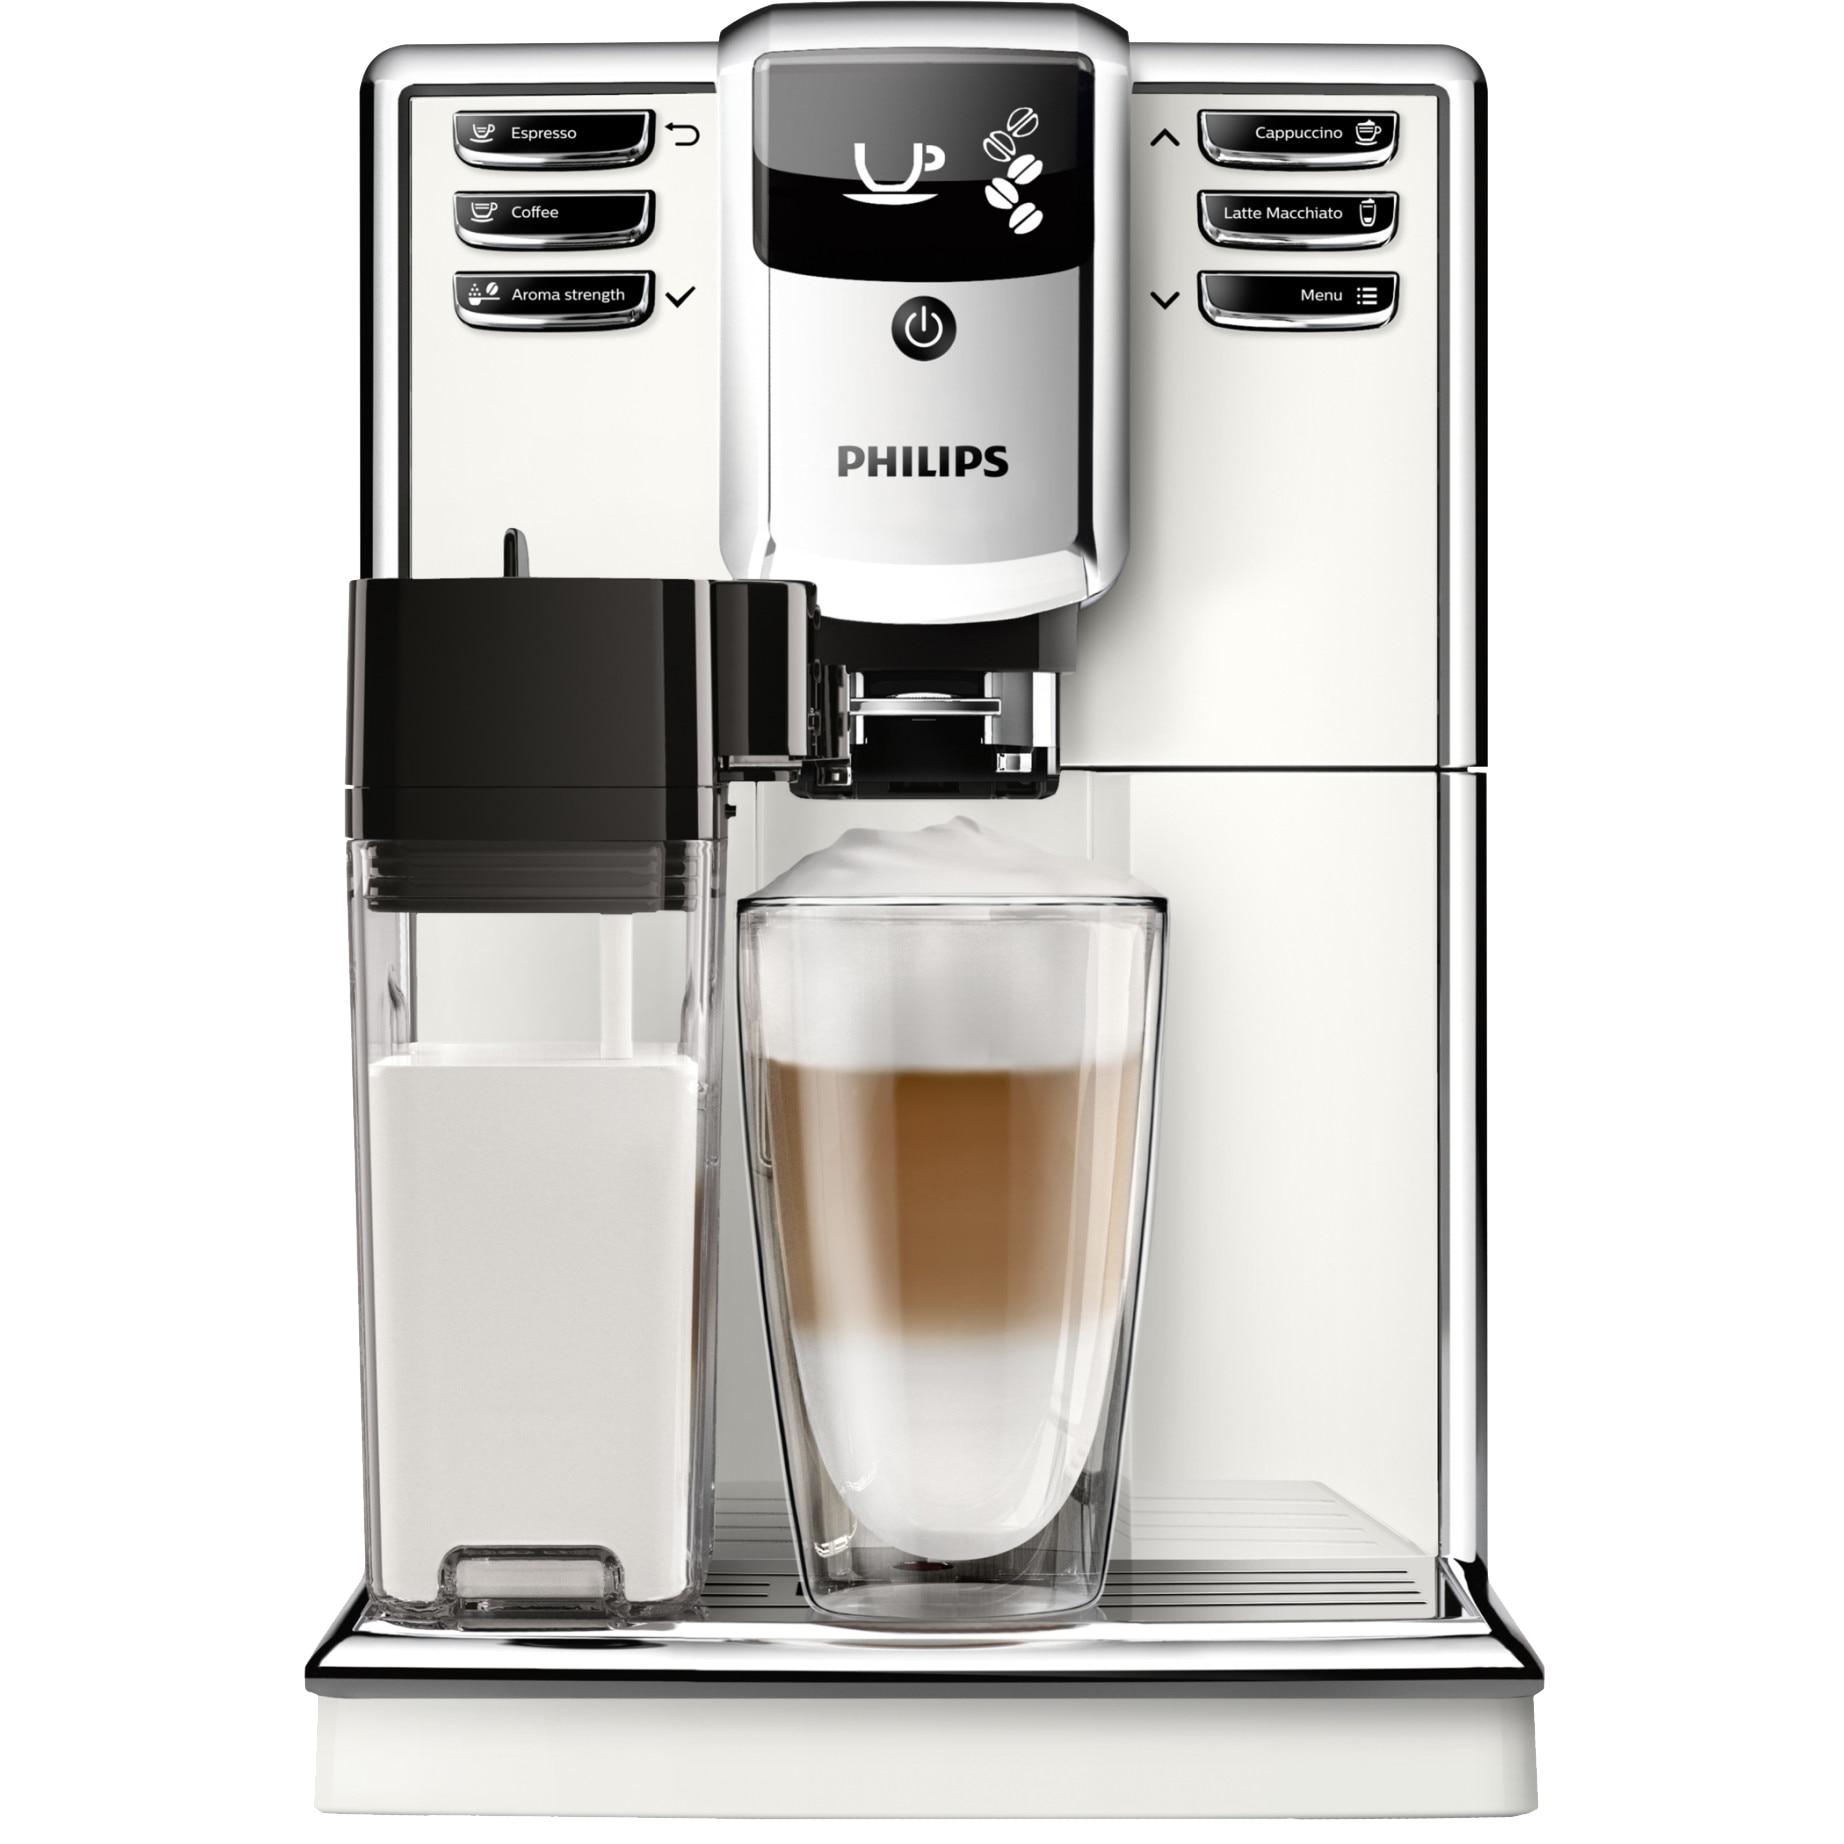 Fotografie Espressor super-automat Philips EP5361/10 Seria 5000, 15 bar, 1.8 L, Sistem AquaClean, Tehnologie CoffeeSwitch, Carafa de lapte integrata, 5 setari intensitate, Optiune cafea macinata, 5 bauturi, Alb